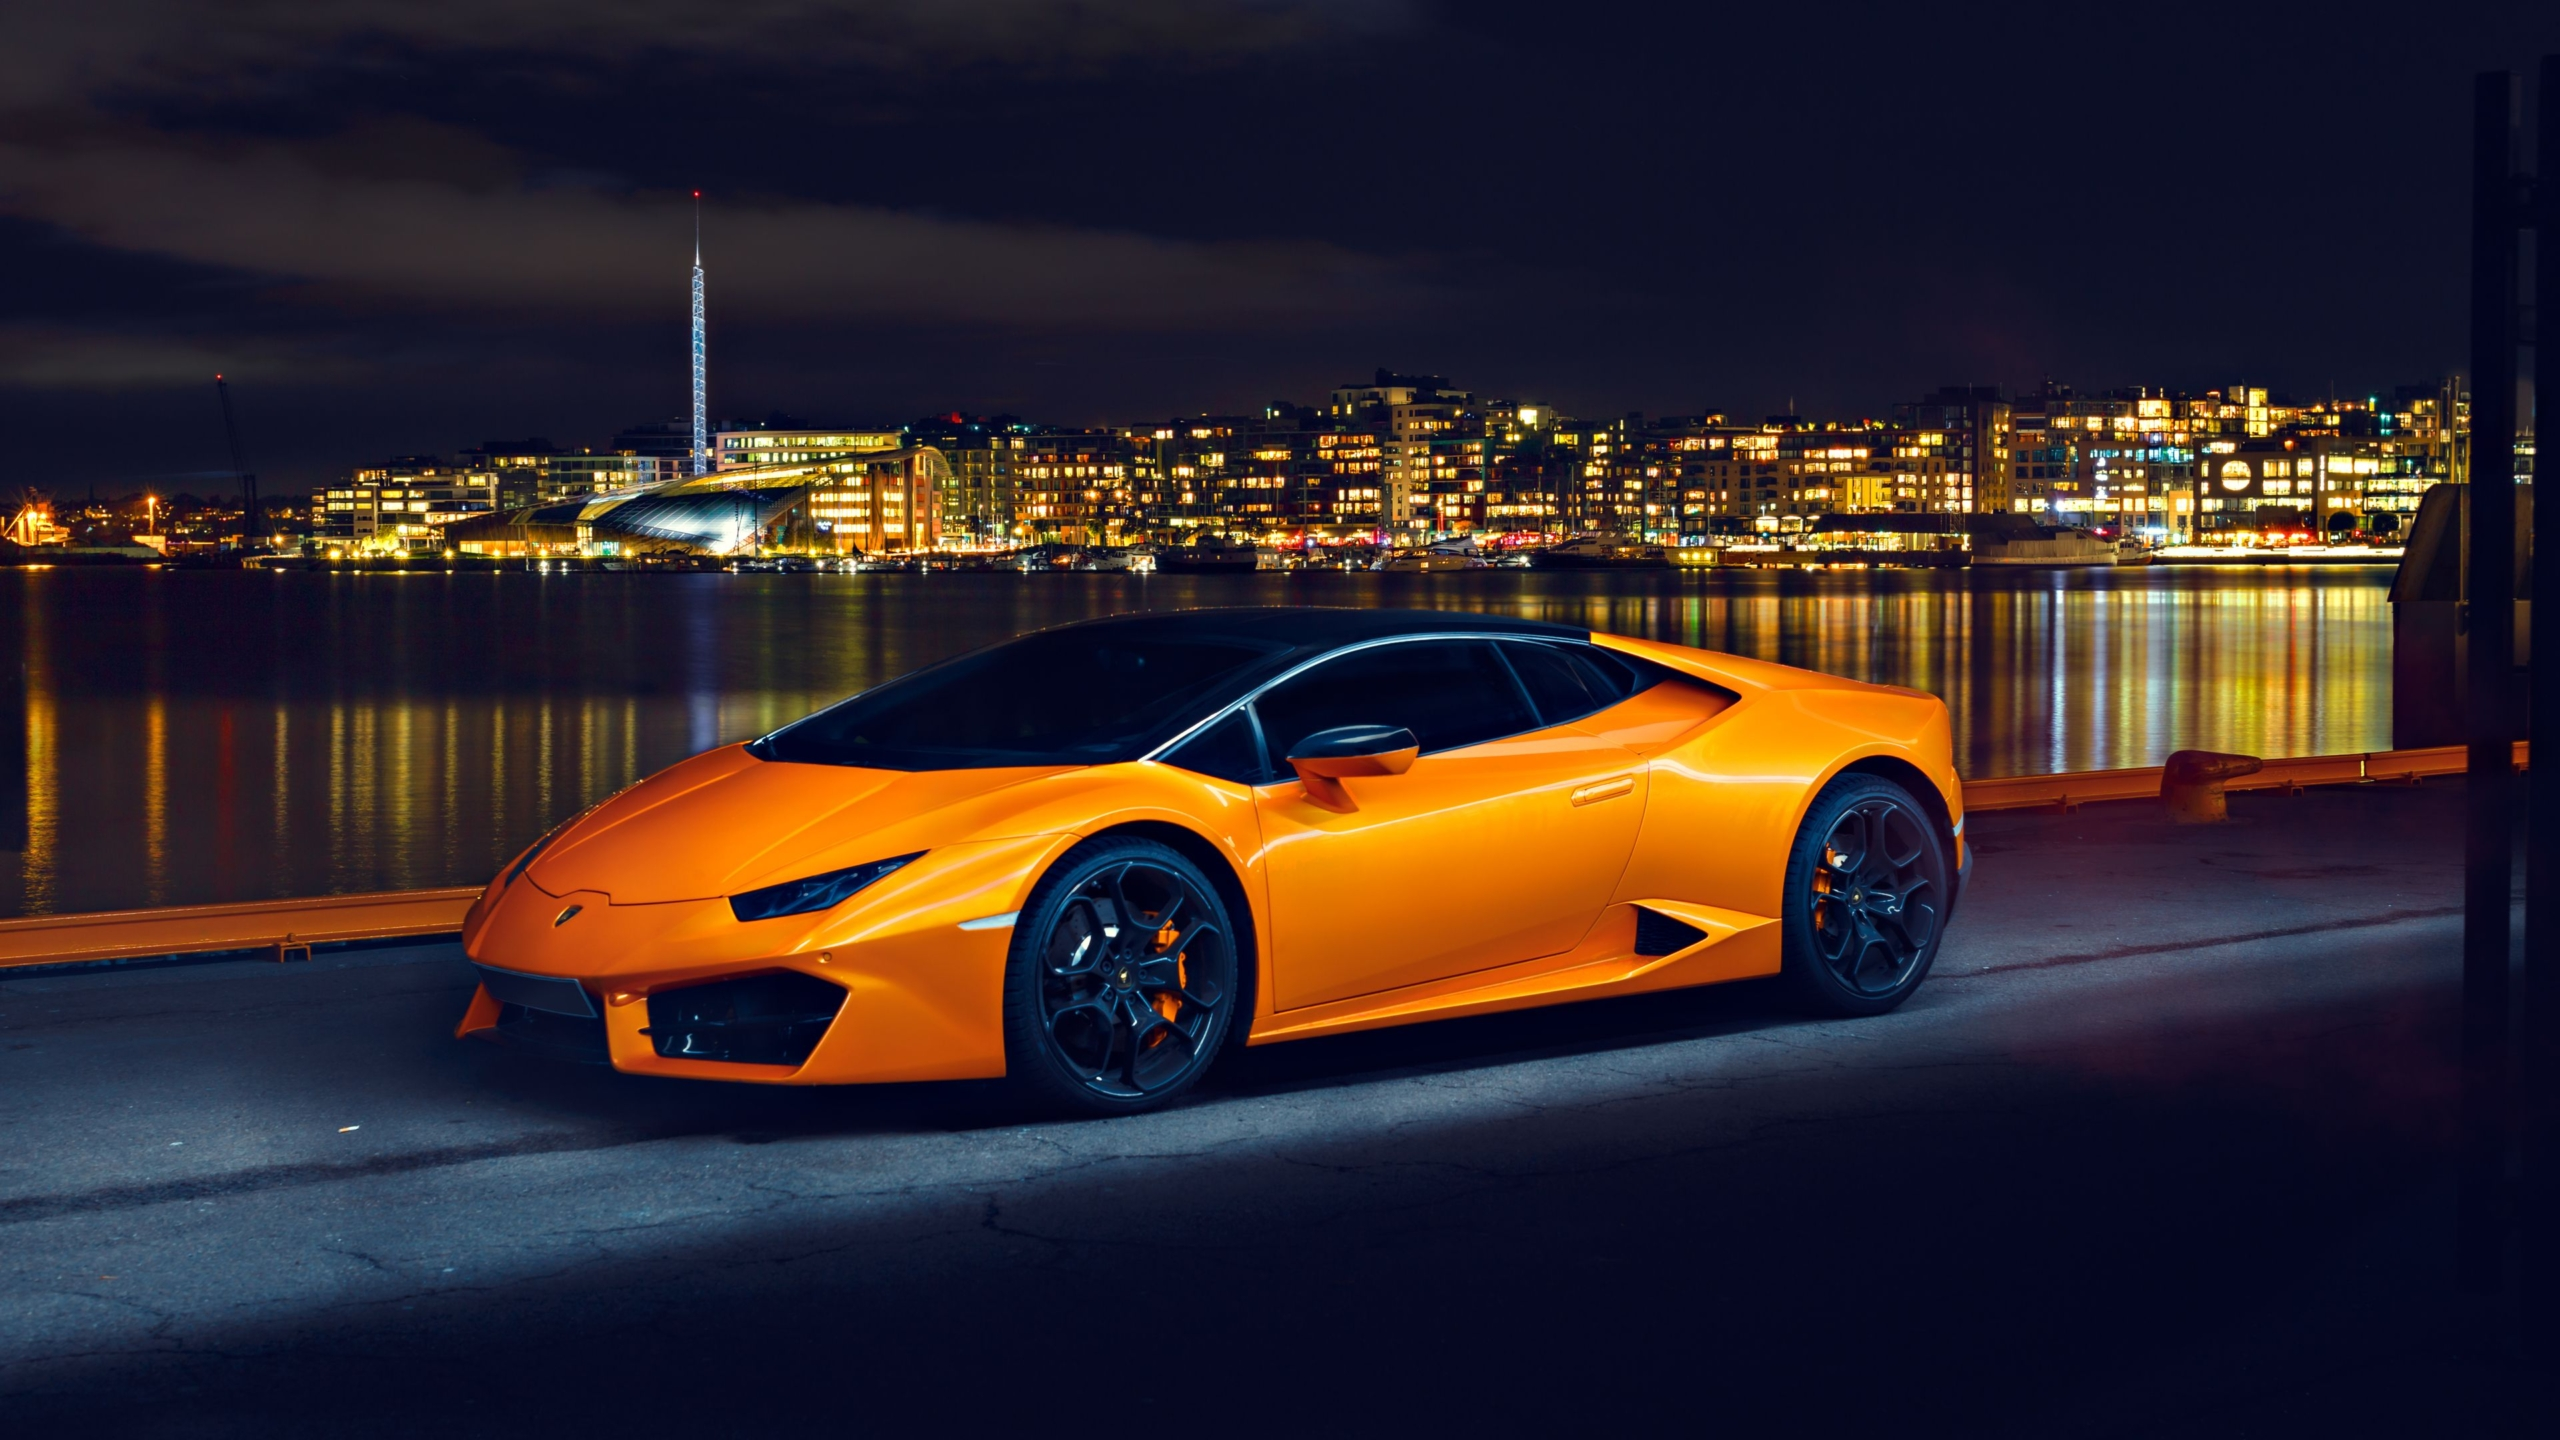 Lamborghini Wallpaper – Choose the Best Wallpaper design For Your Computer